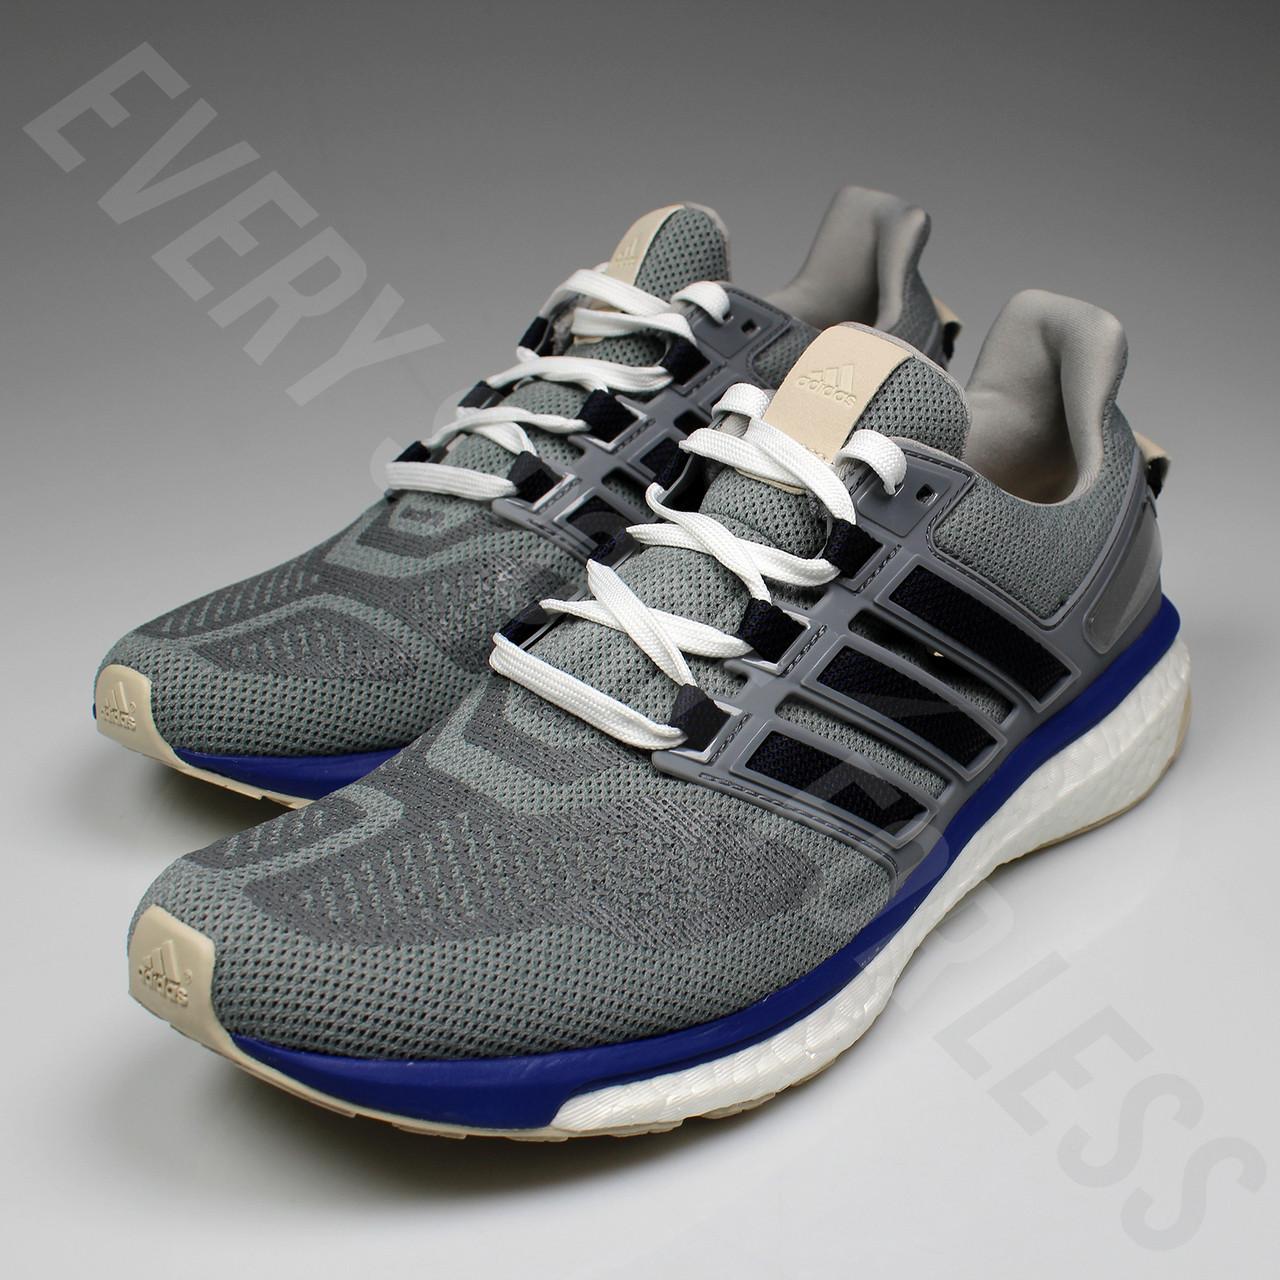 efc2039f9ea ... Adidas Energy Boost 3 Men s Running Shoes AQ5958 ...